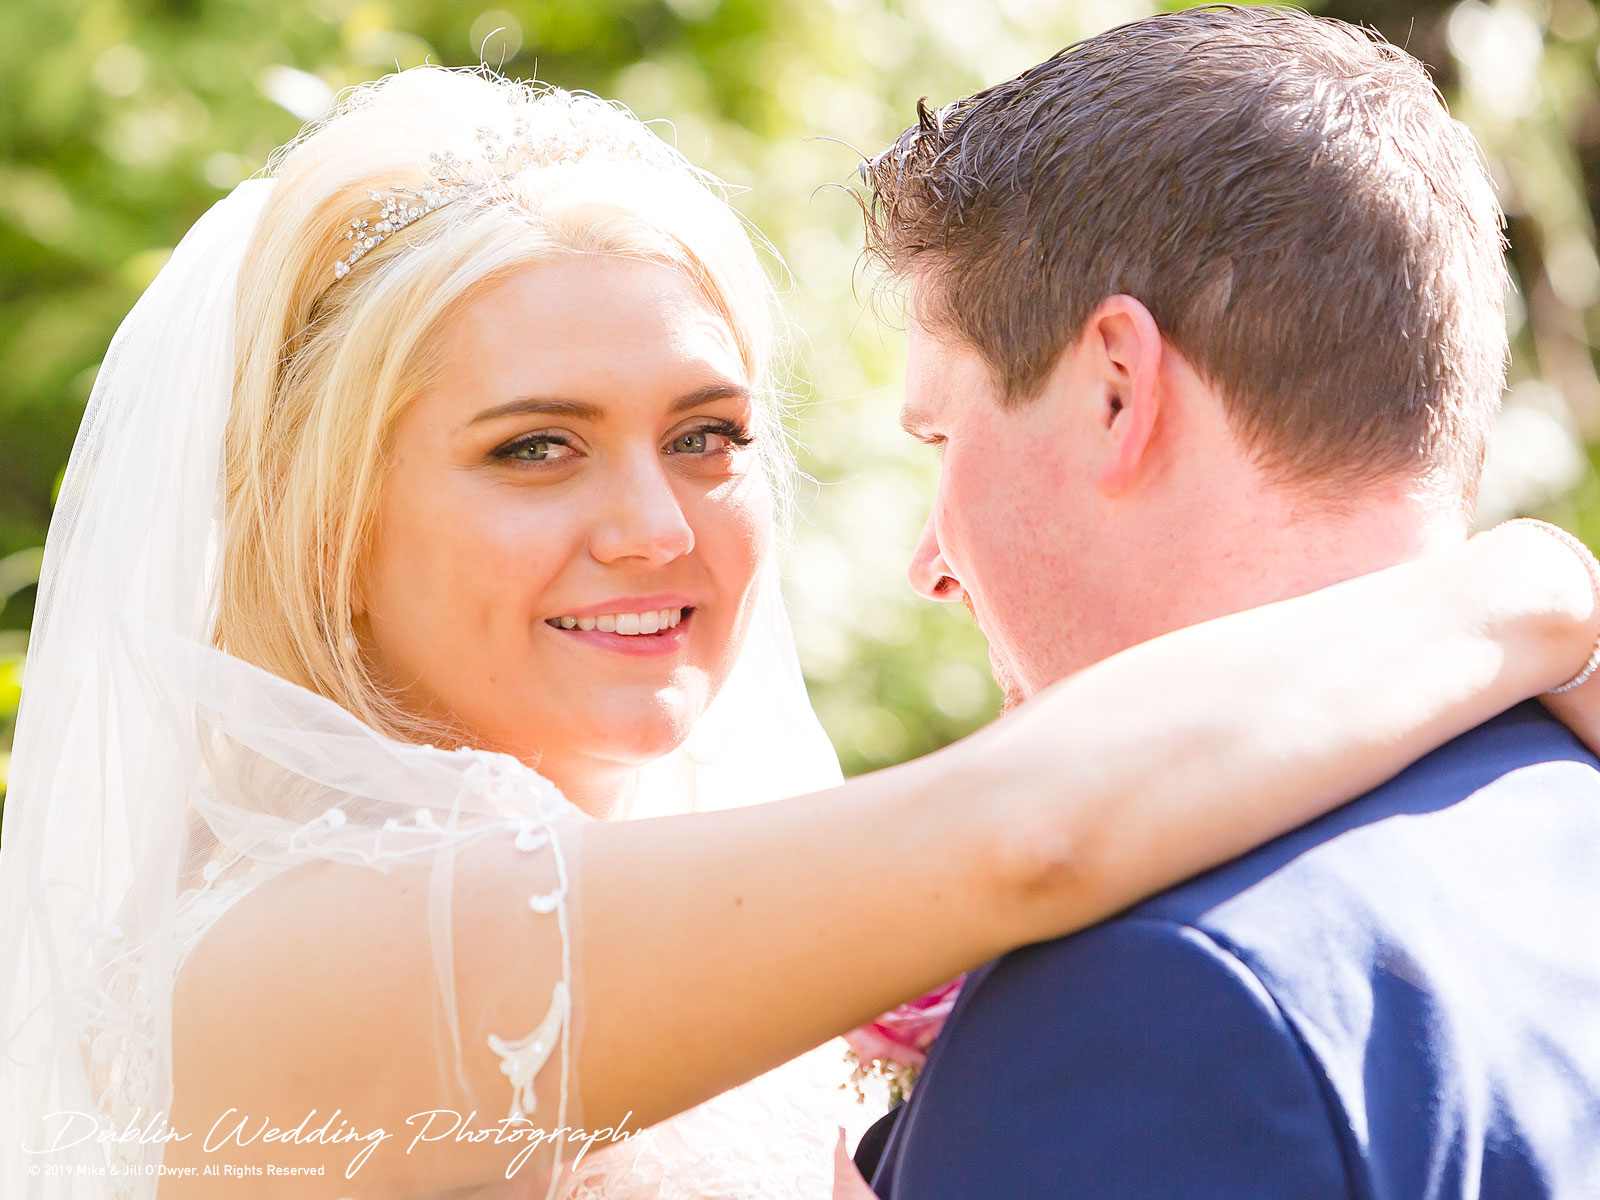 wedding-photographer-wicklow-glenview-hotel-KS038.jpg